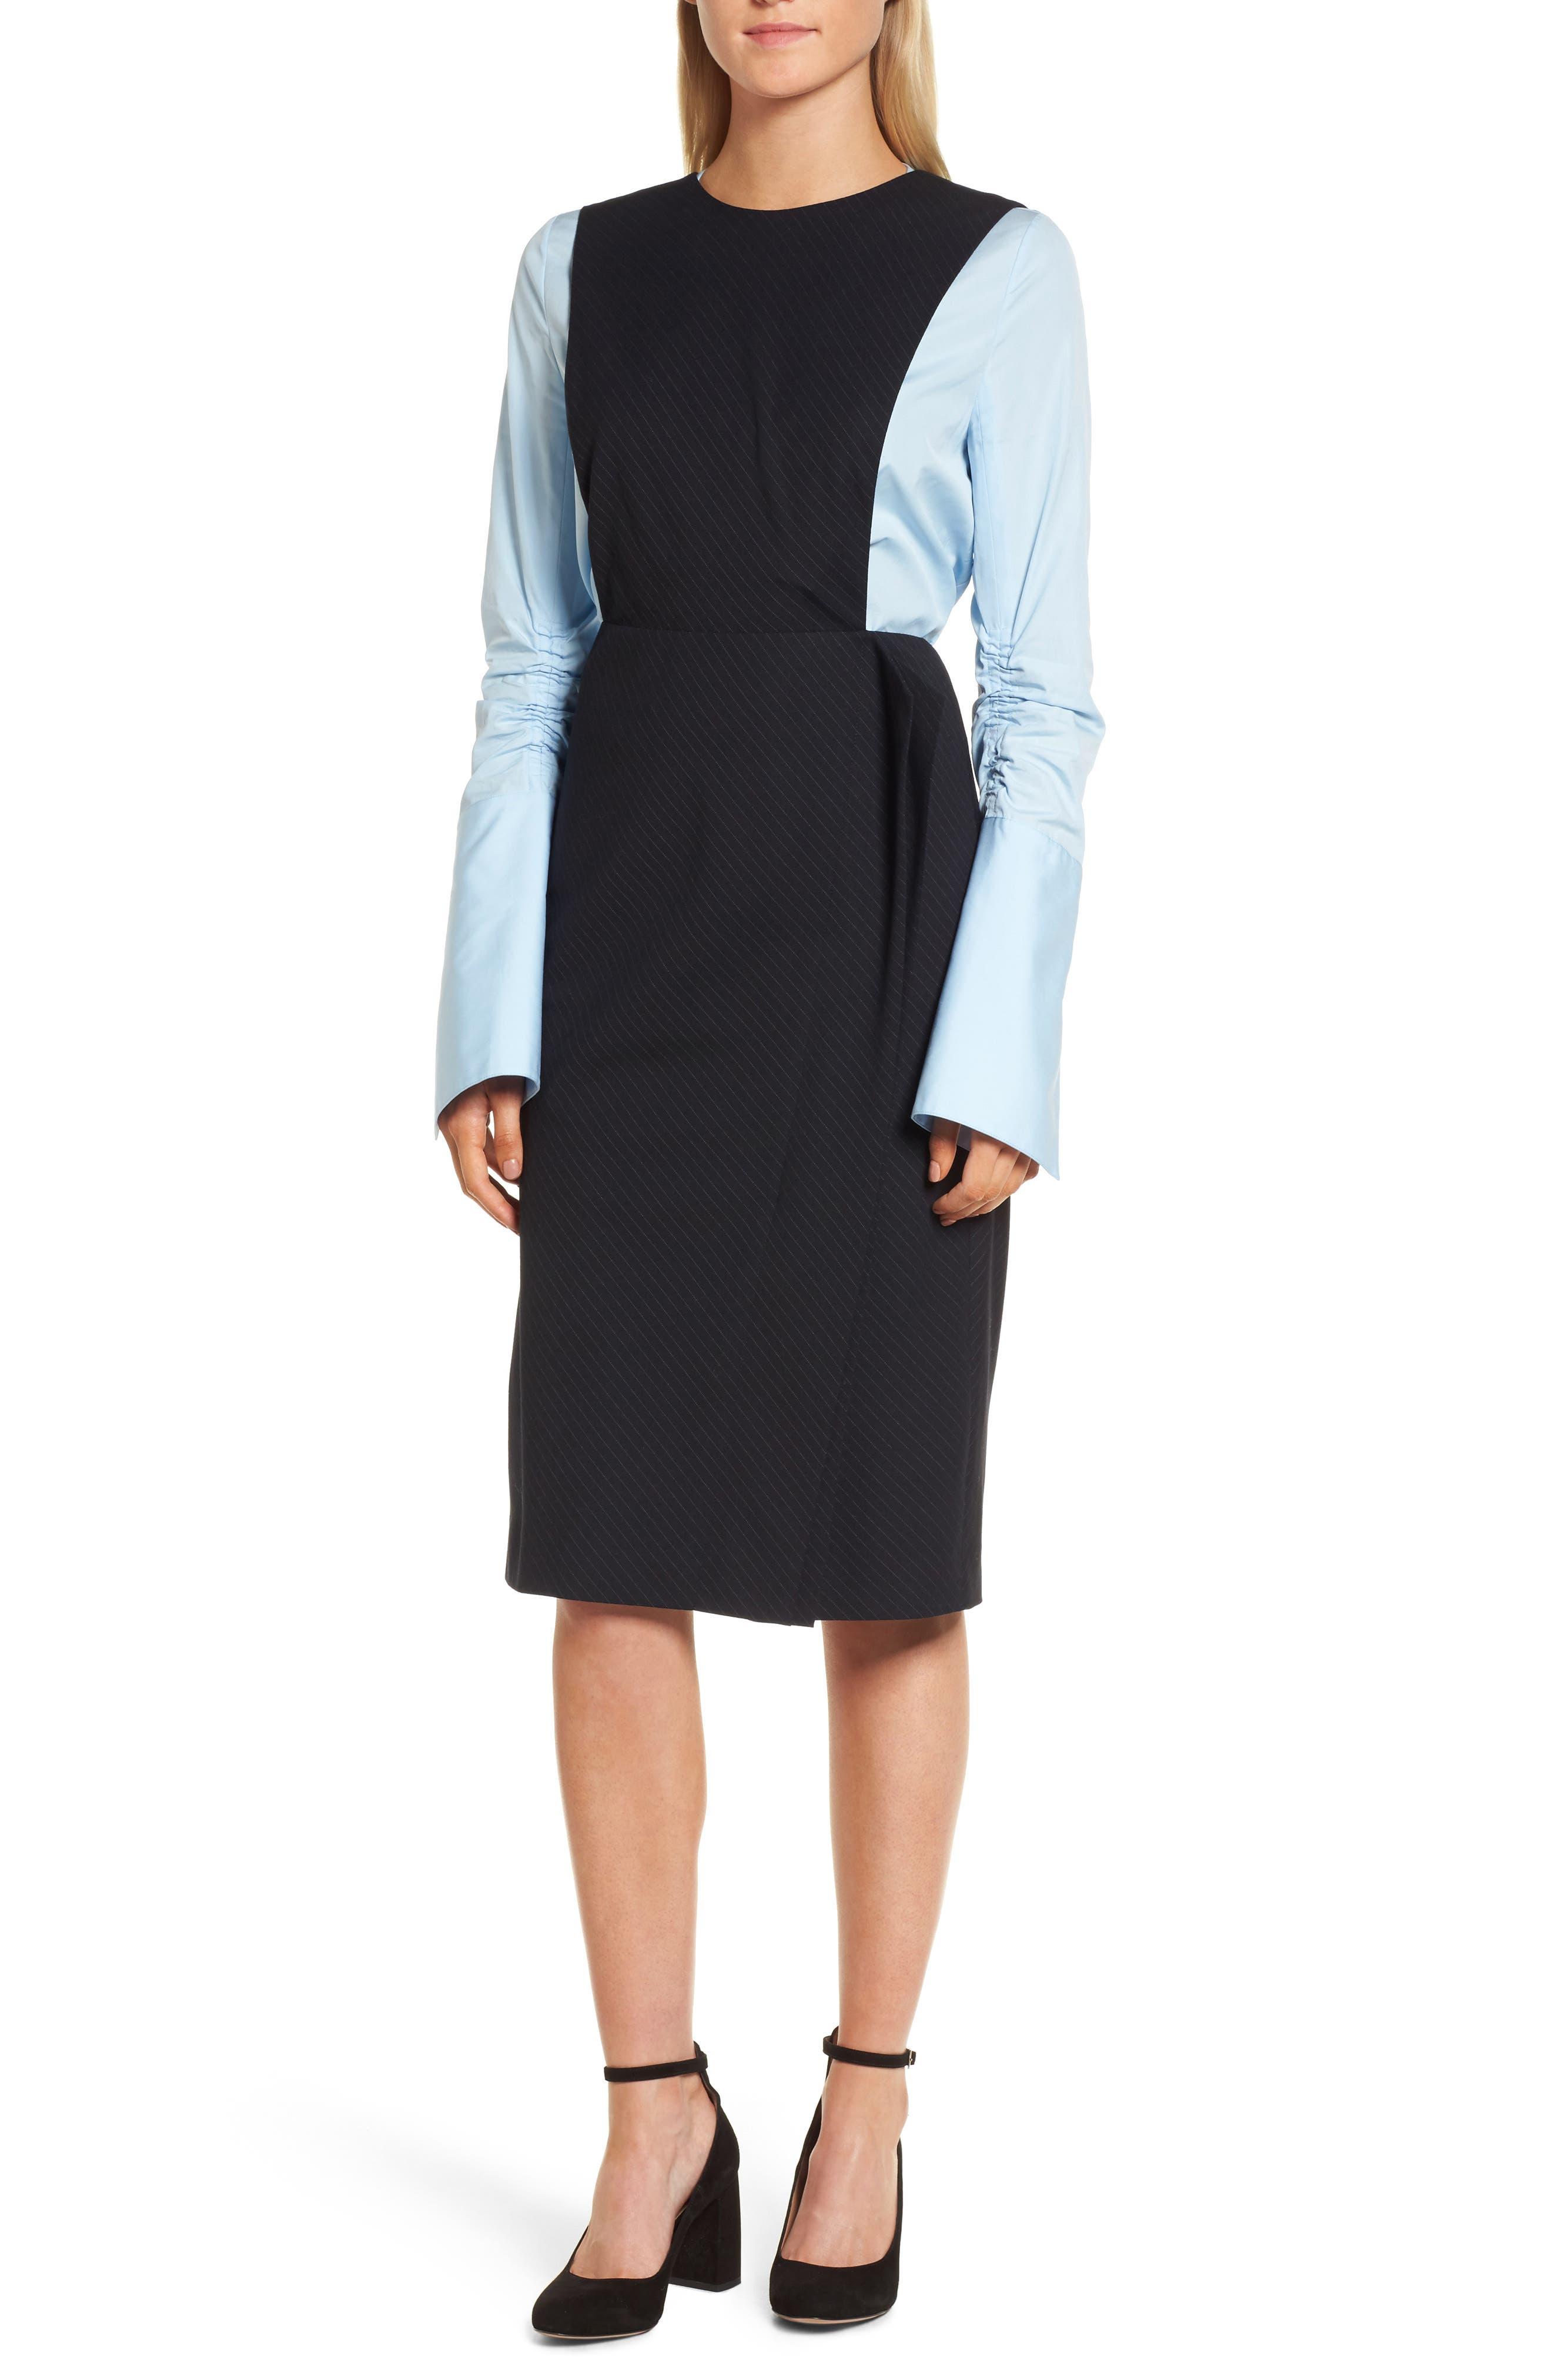 Bias Cut Pinstripe Jumper Dress,                         Main,                         color, Navy Night Pinstripe